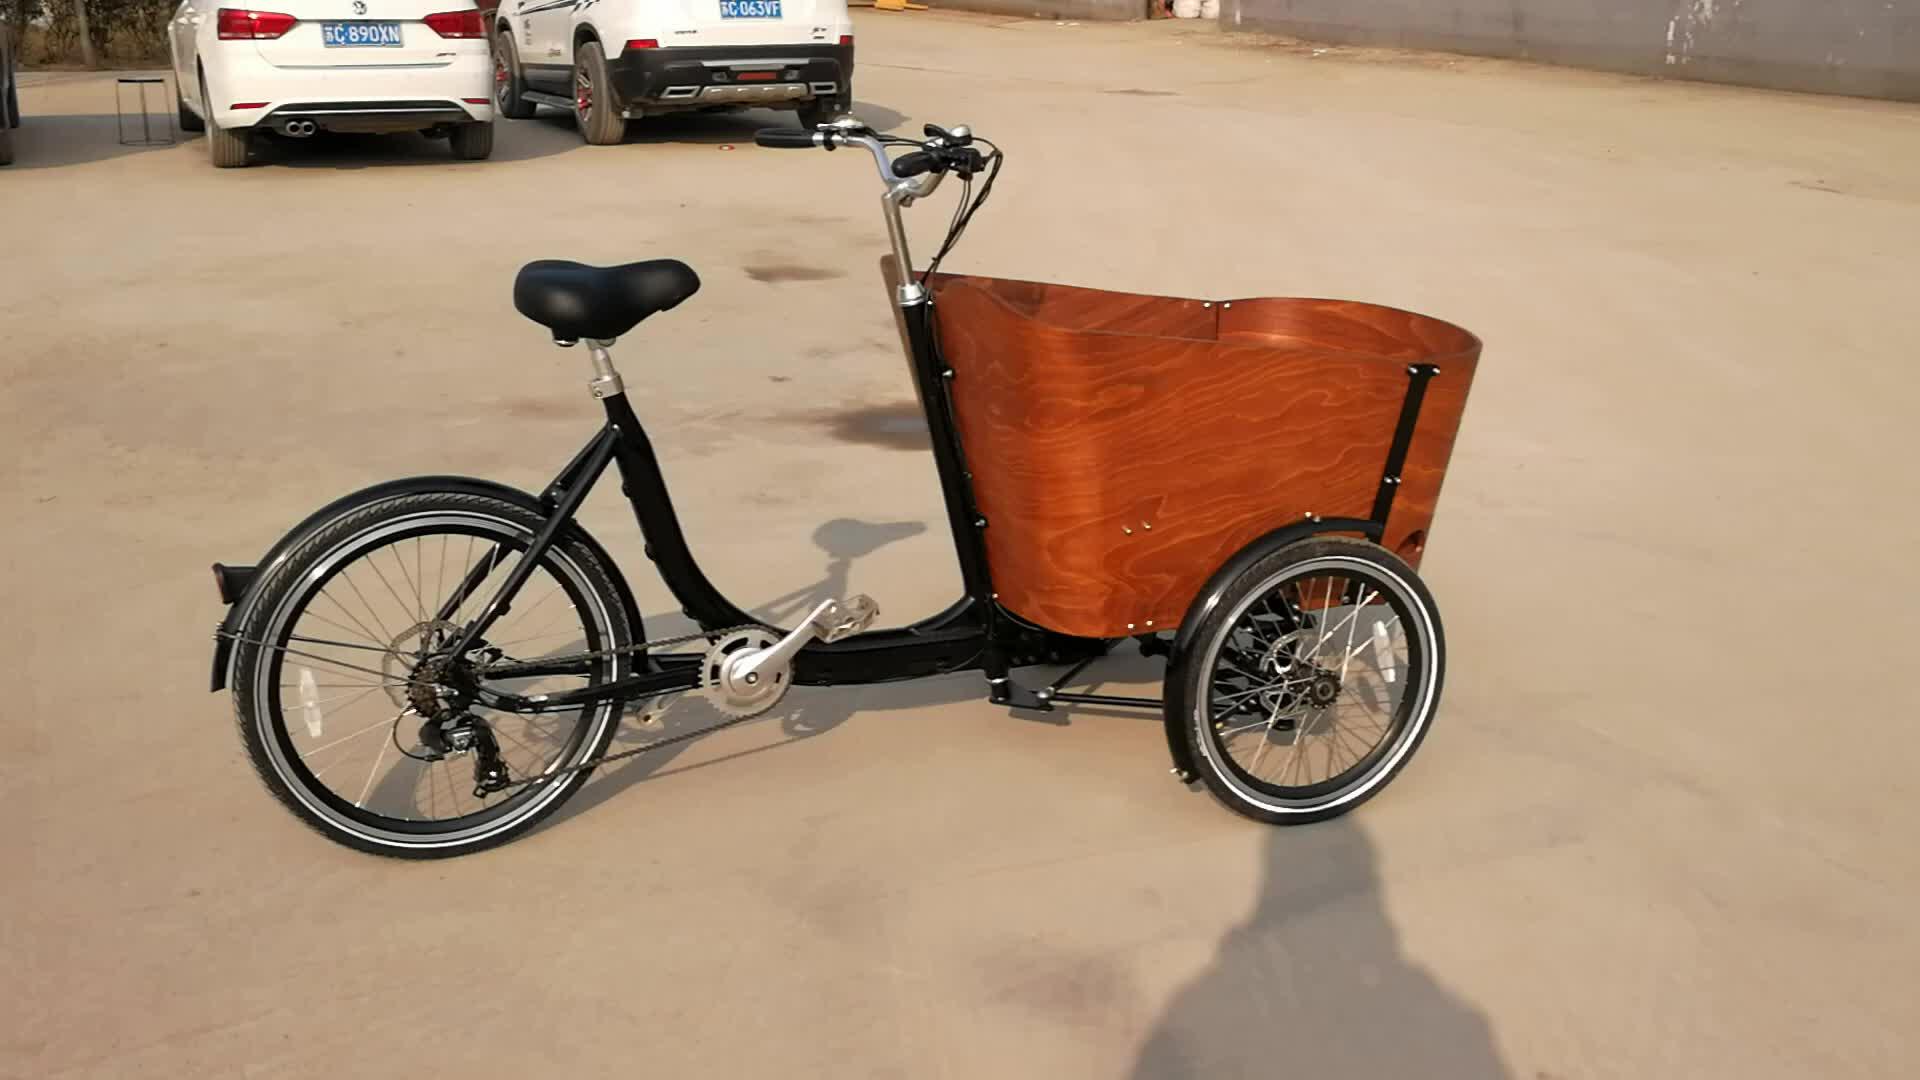 40-60 km טווח לכל כוח 36 מתח מתקפל אופניים חשמליים תלת אופן מטען עם קופסא עץ יפה במחיר המפעל